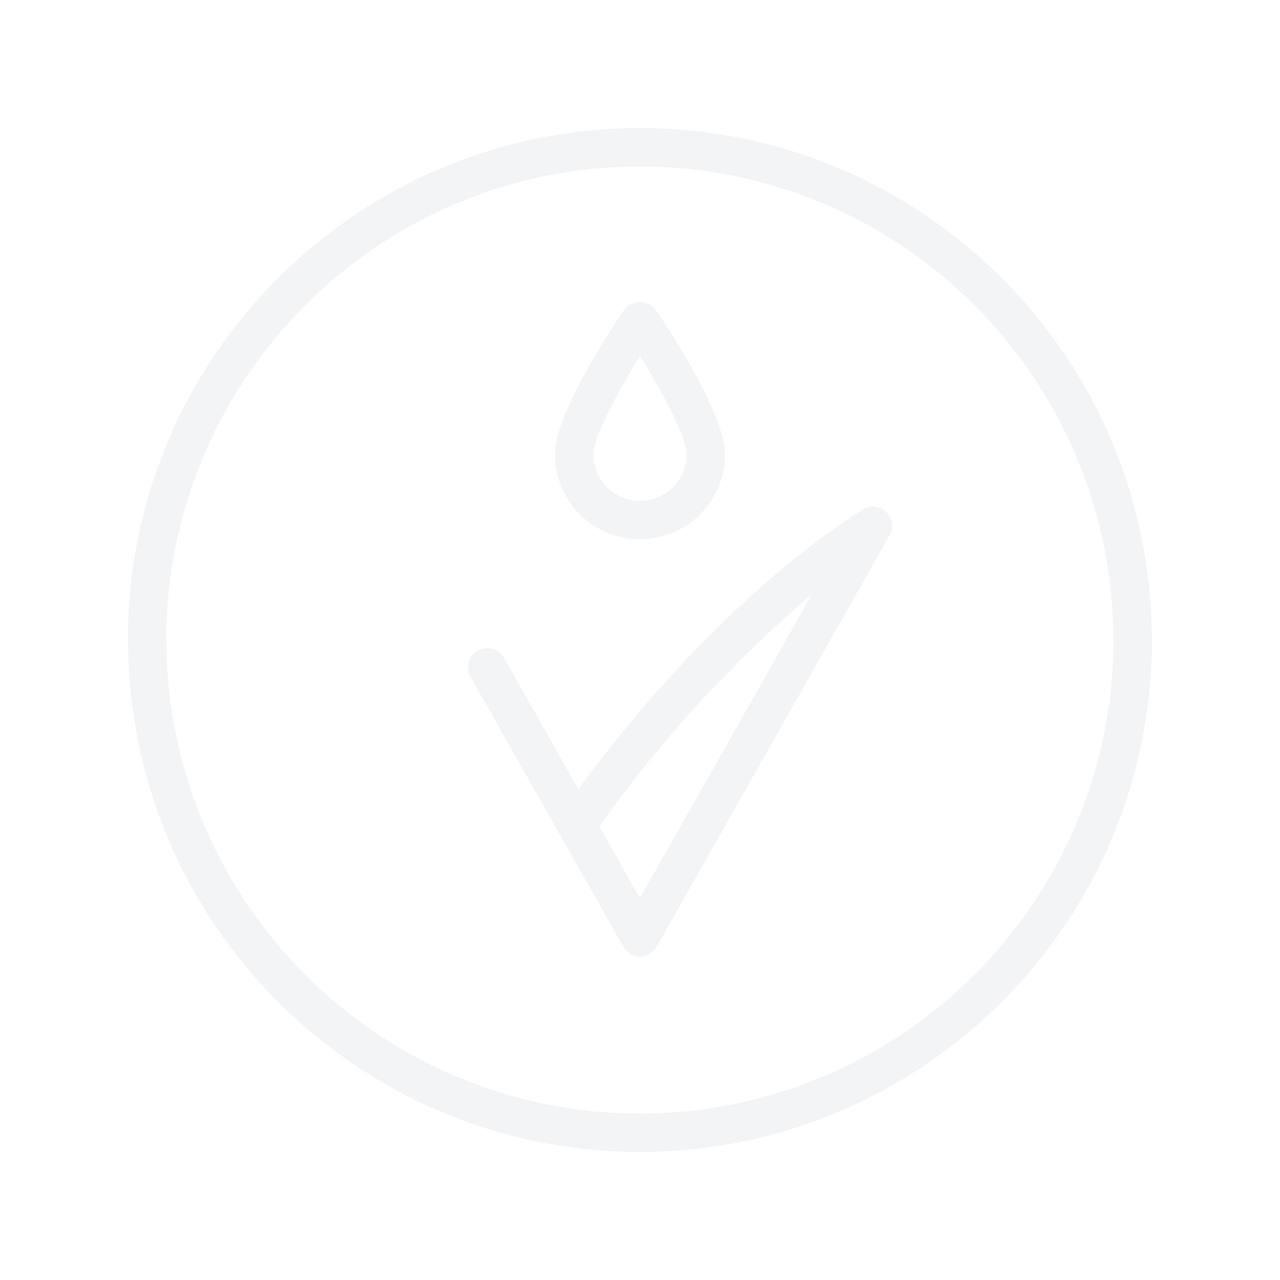 Calvin Klein Sheer Beauty Eau De Toilette